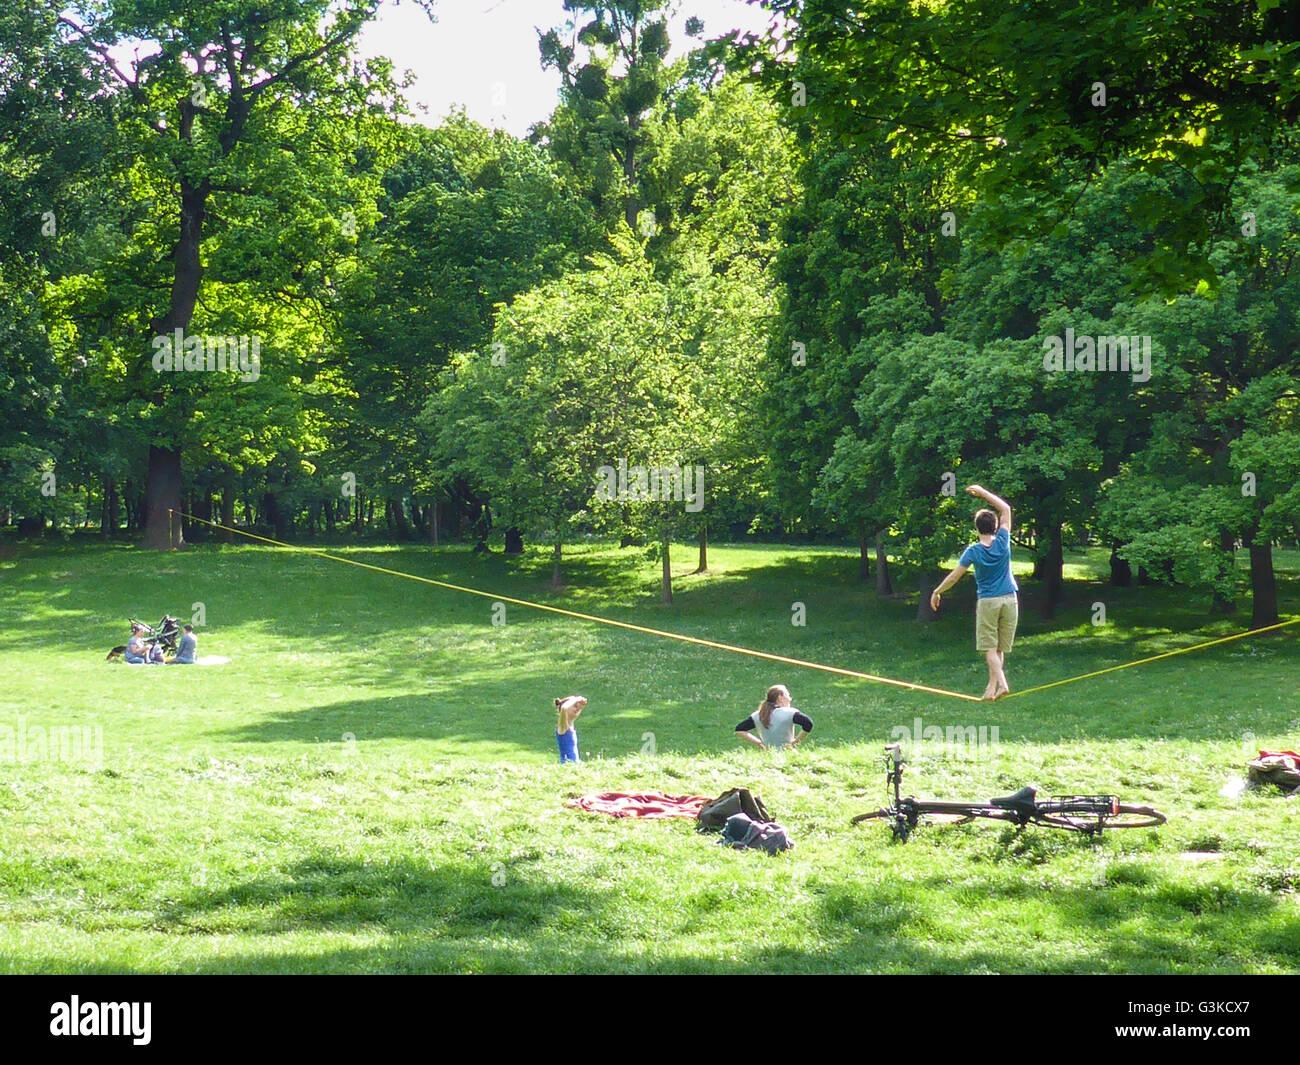 Teenagers slacklining in Prater, Austria, Wien, 02., Wien, Vienna - Stock Image